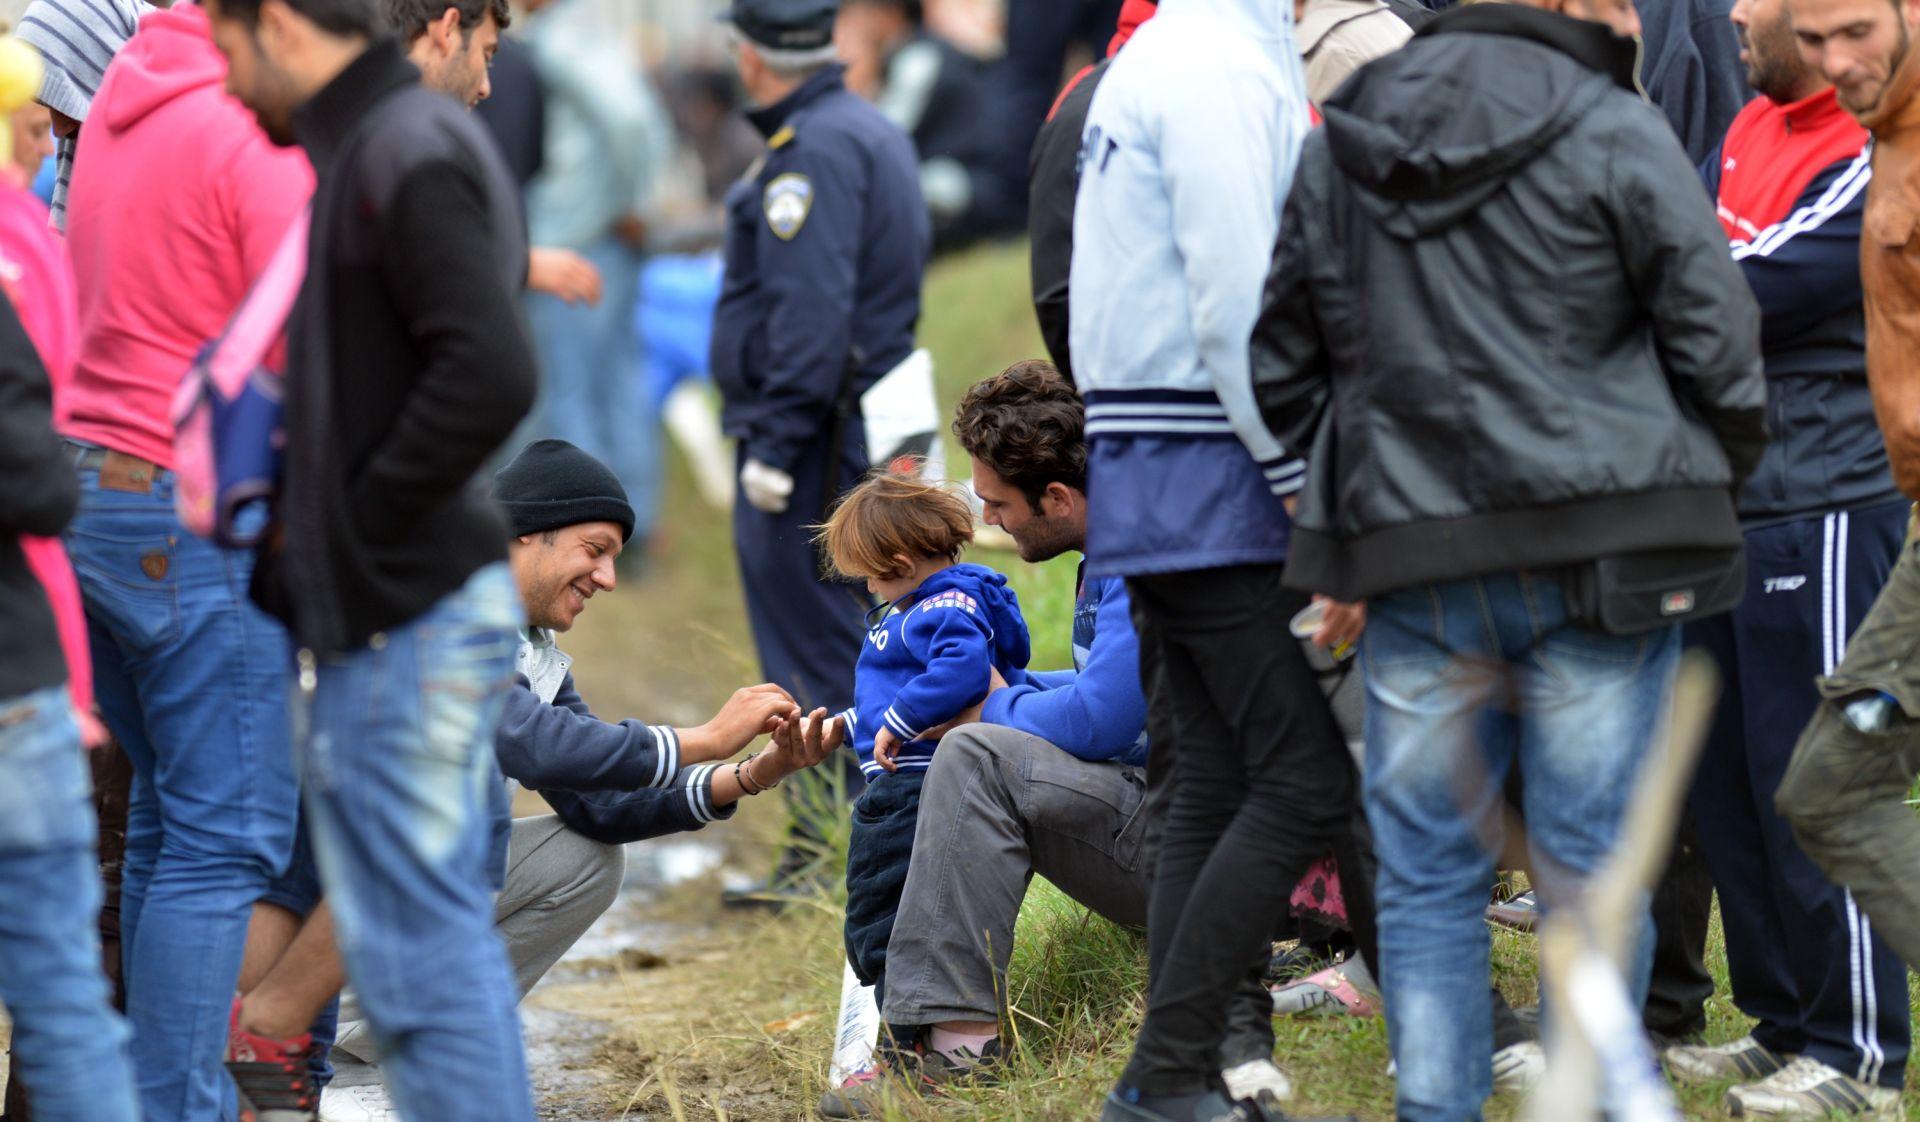 DO PODNEVA UŠLO 2906 IZBJEGLICA Jutros u prepunom Opatovcu došlo do incidenta